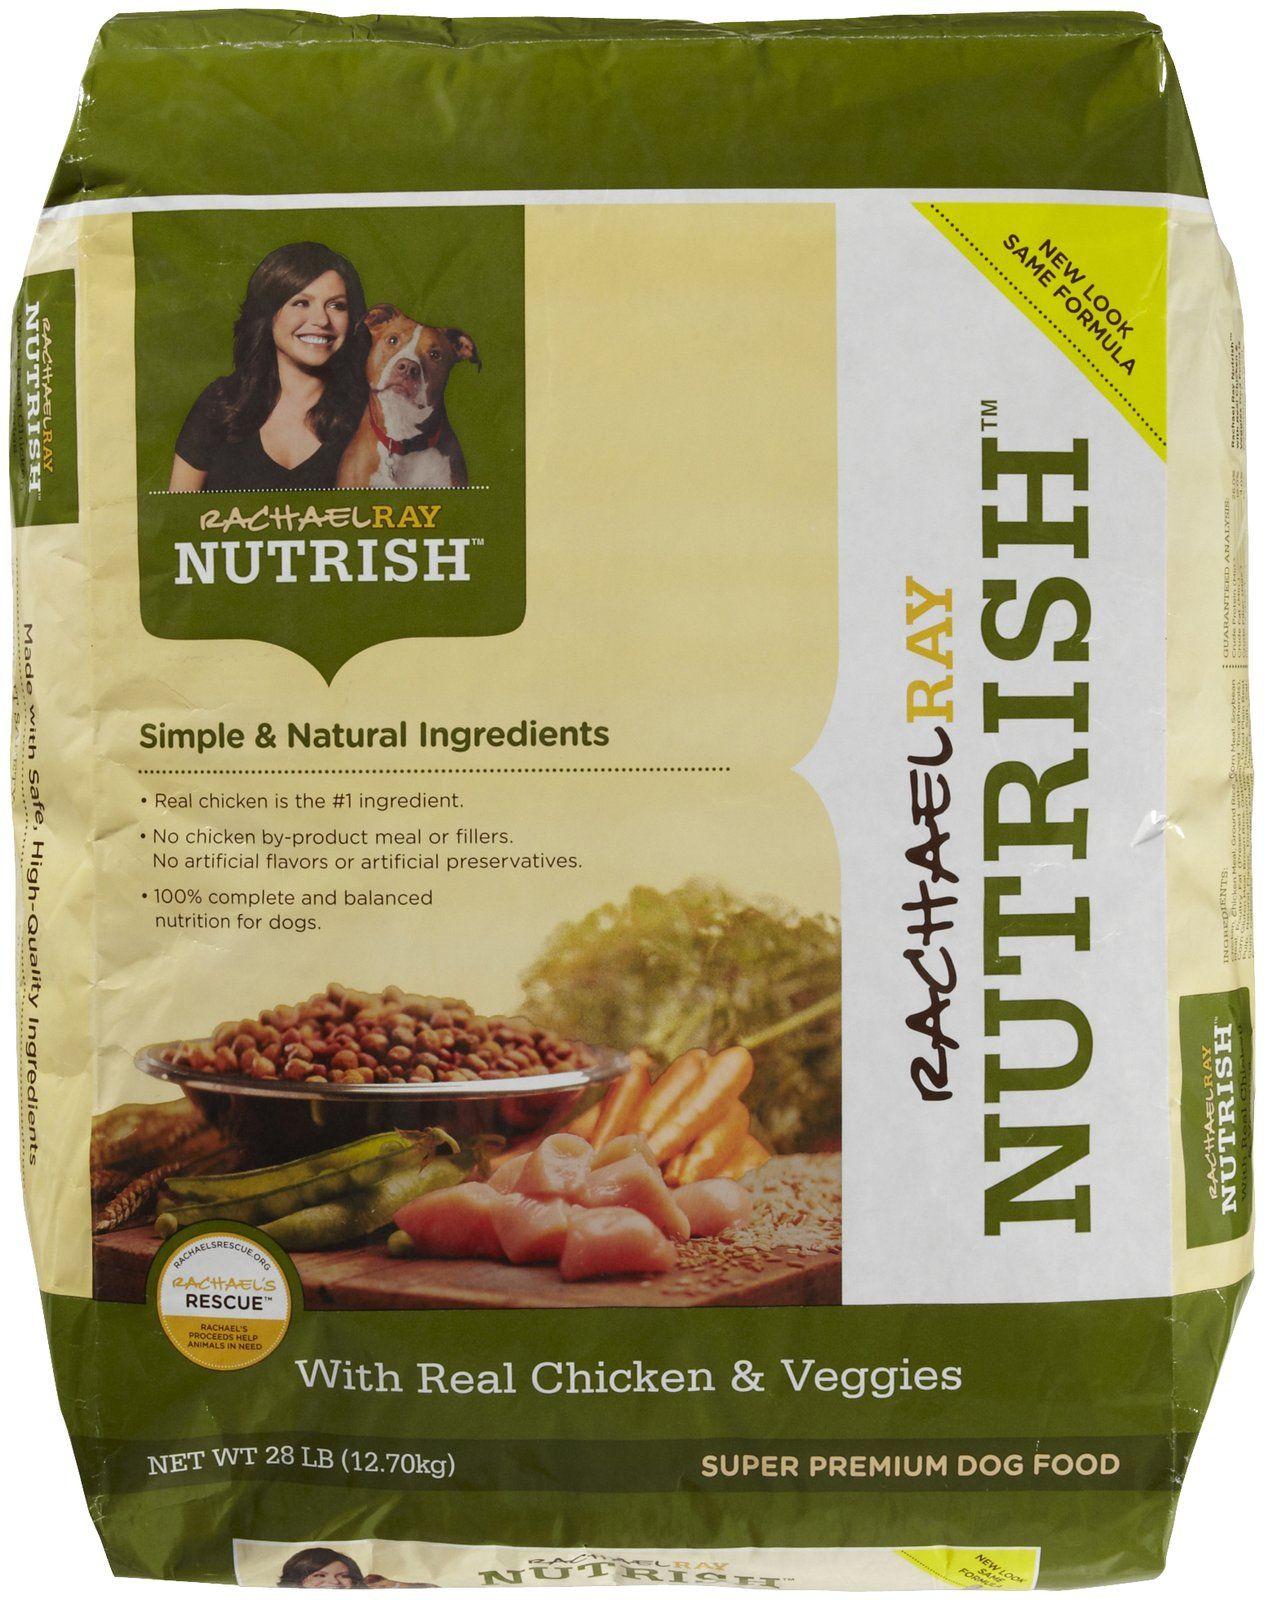 Rachael Ray Nutrish Chicken & Veggies Dog Food Free Shipping